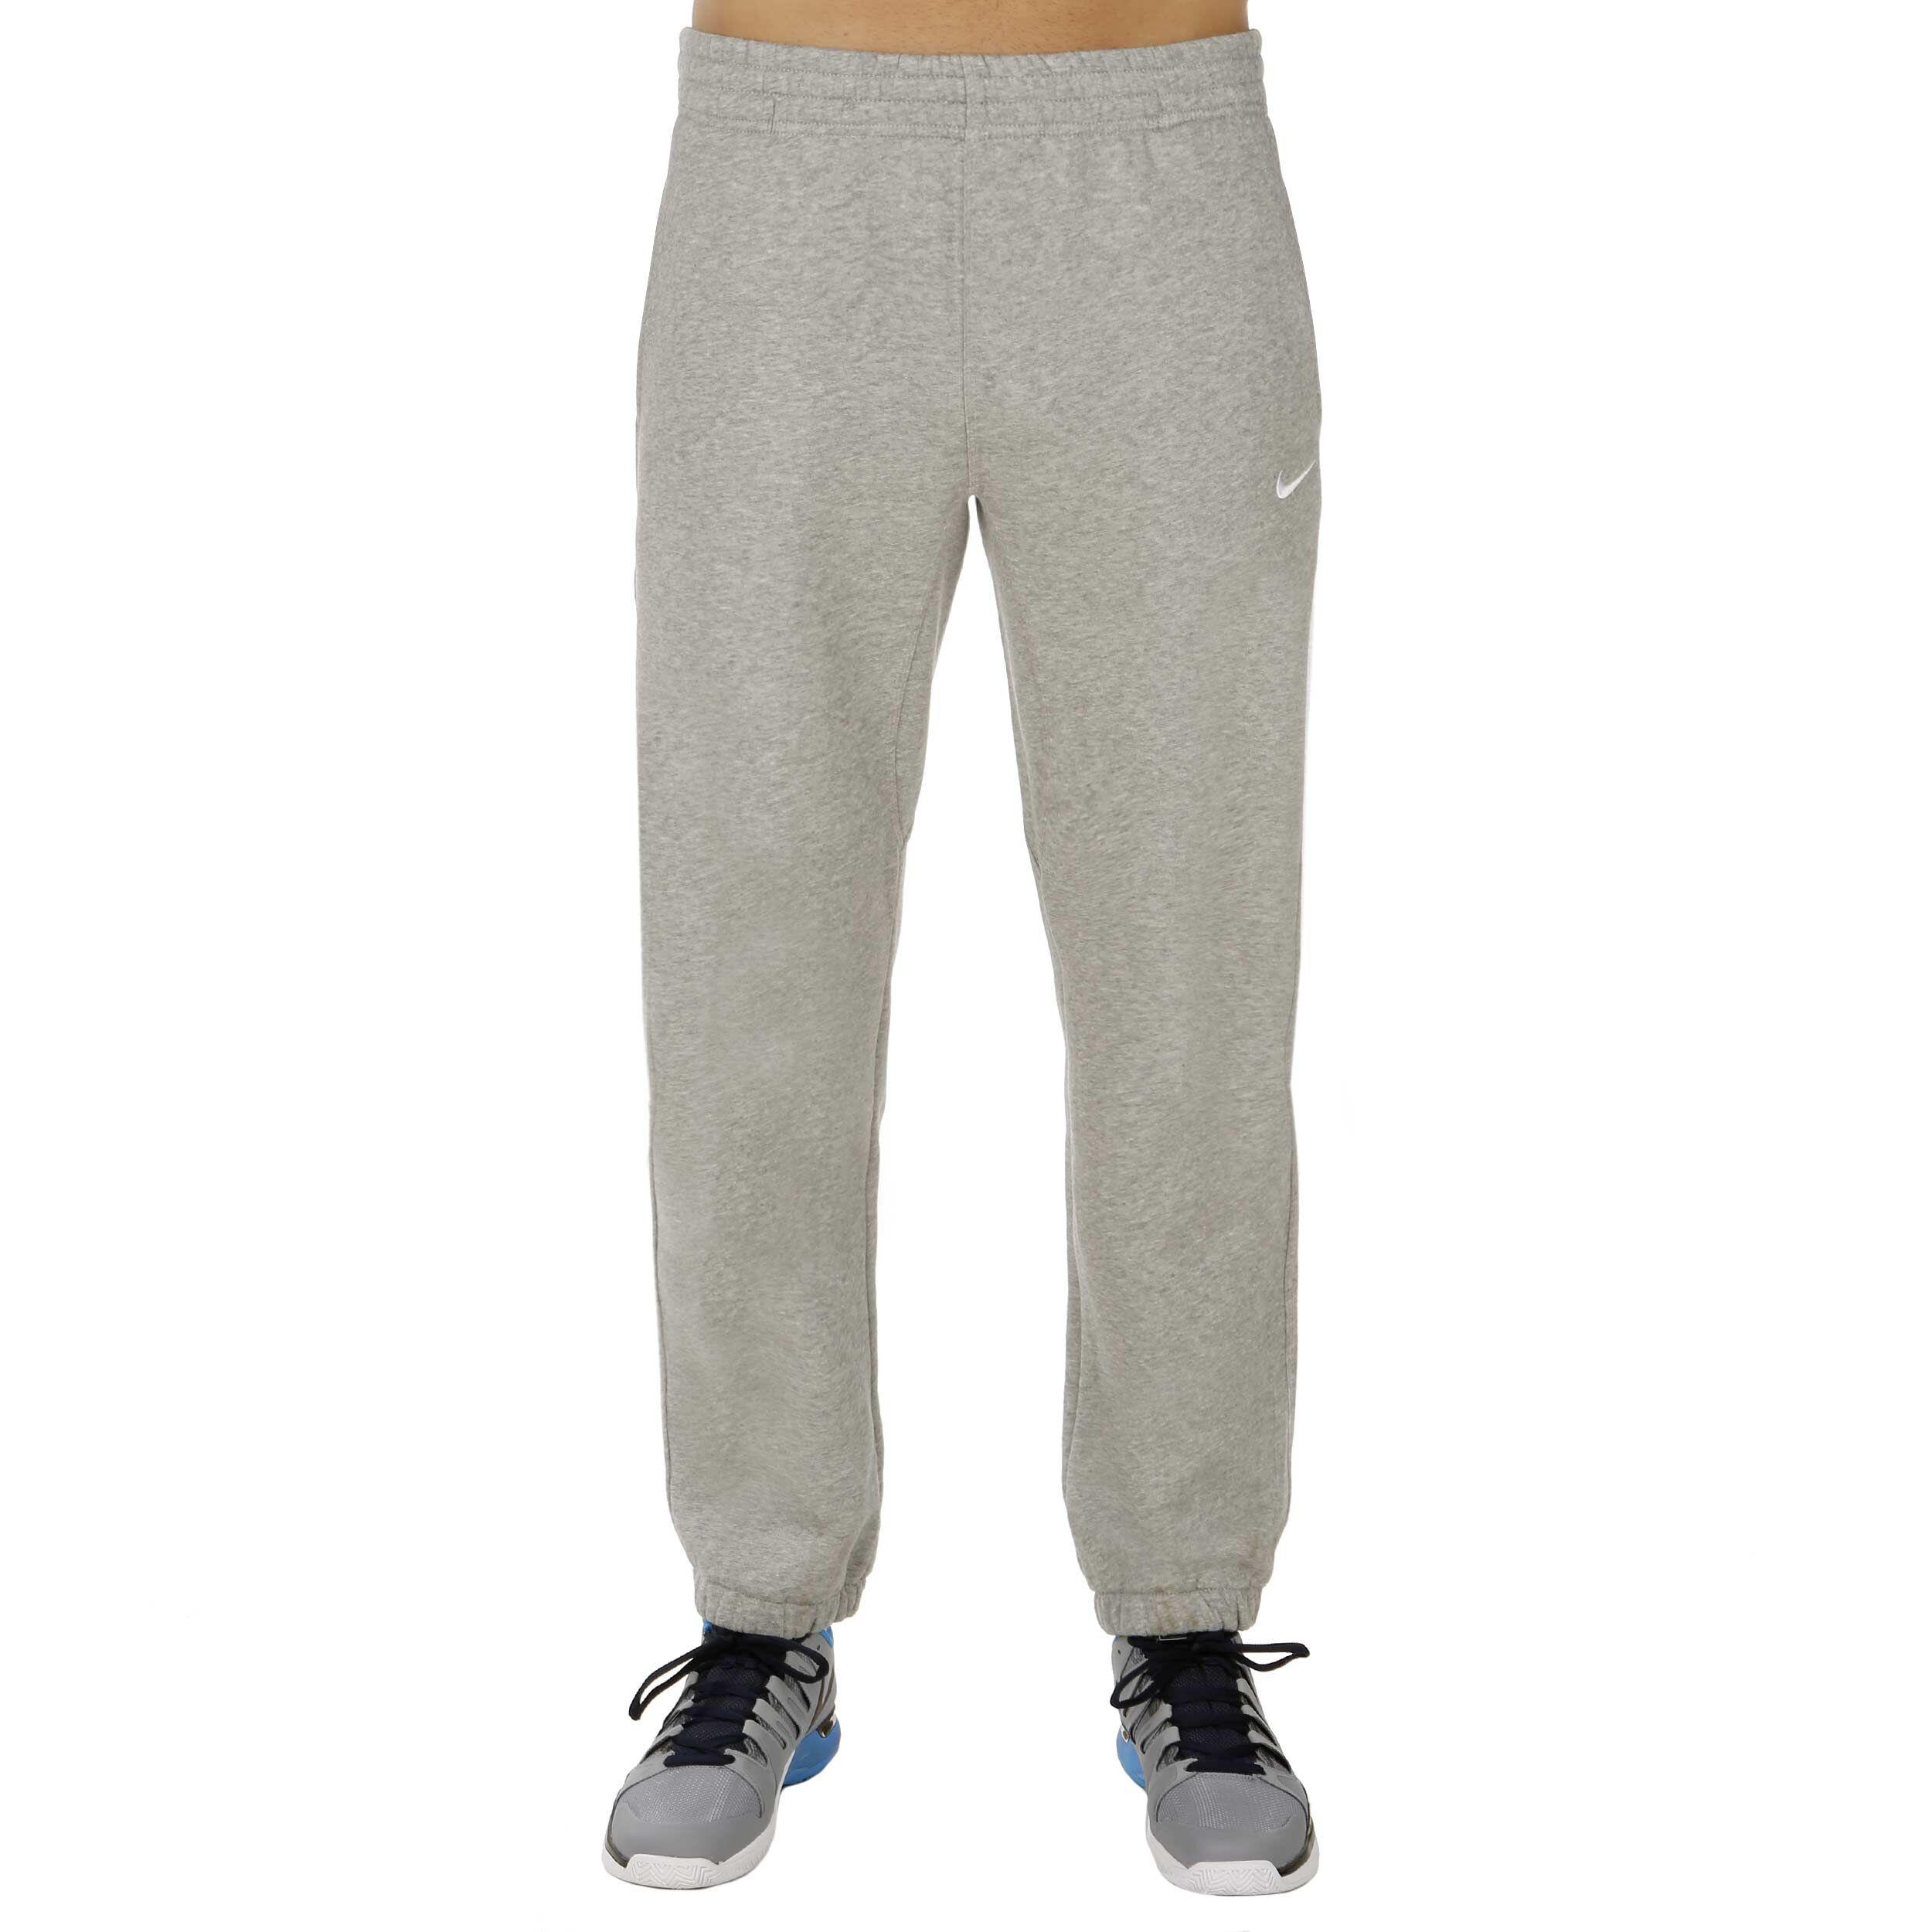 Nike Club Cuff Pant Swoosh Pantalon Survêtement Hommes